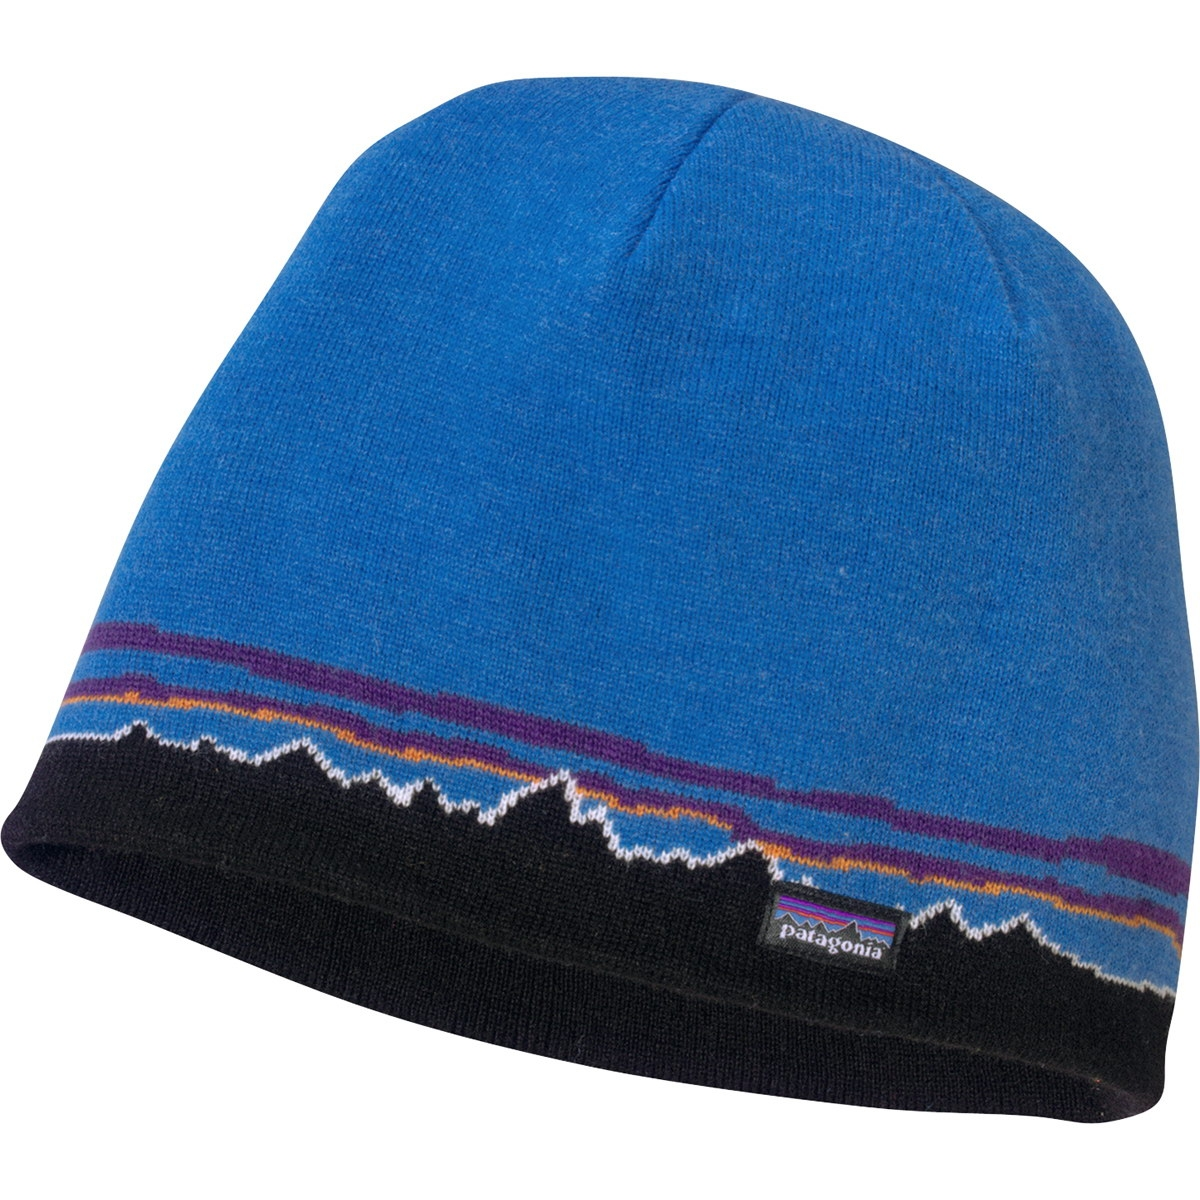 Patagonia Angebote –  40 Prozent Rabatt auf Patagonia Beanie Hat Classic Fitz Roy – Mütze